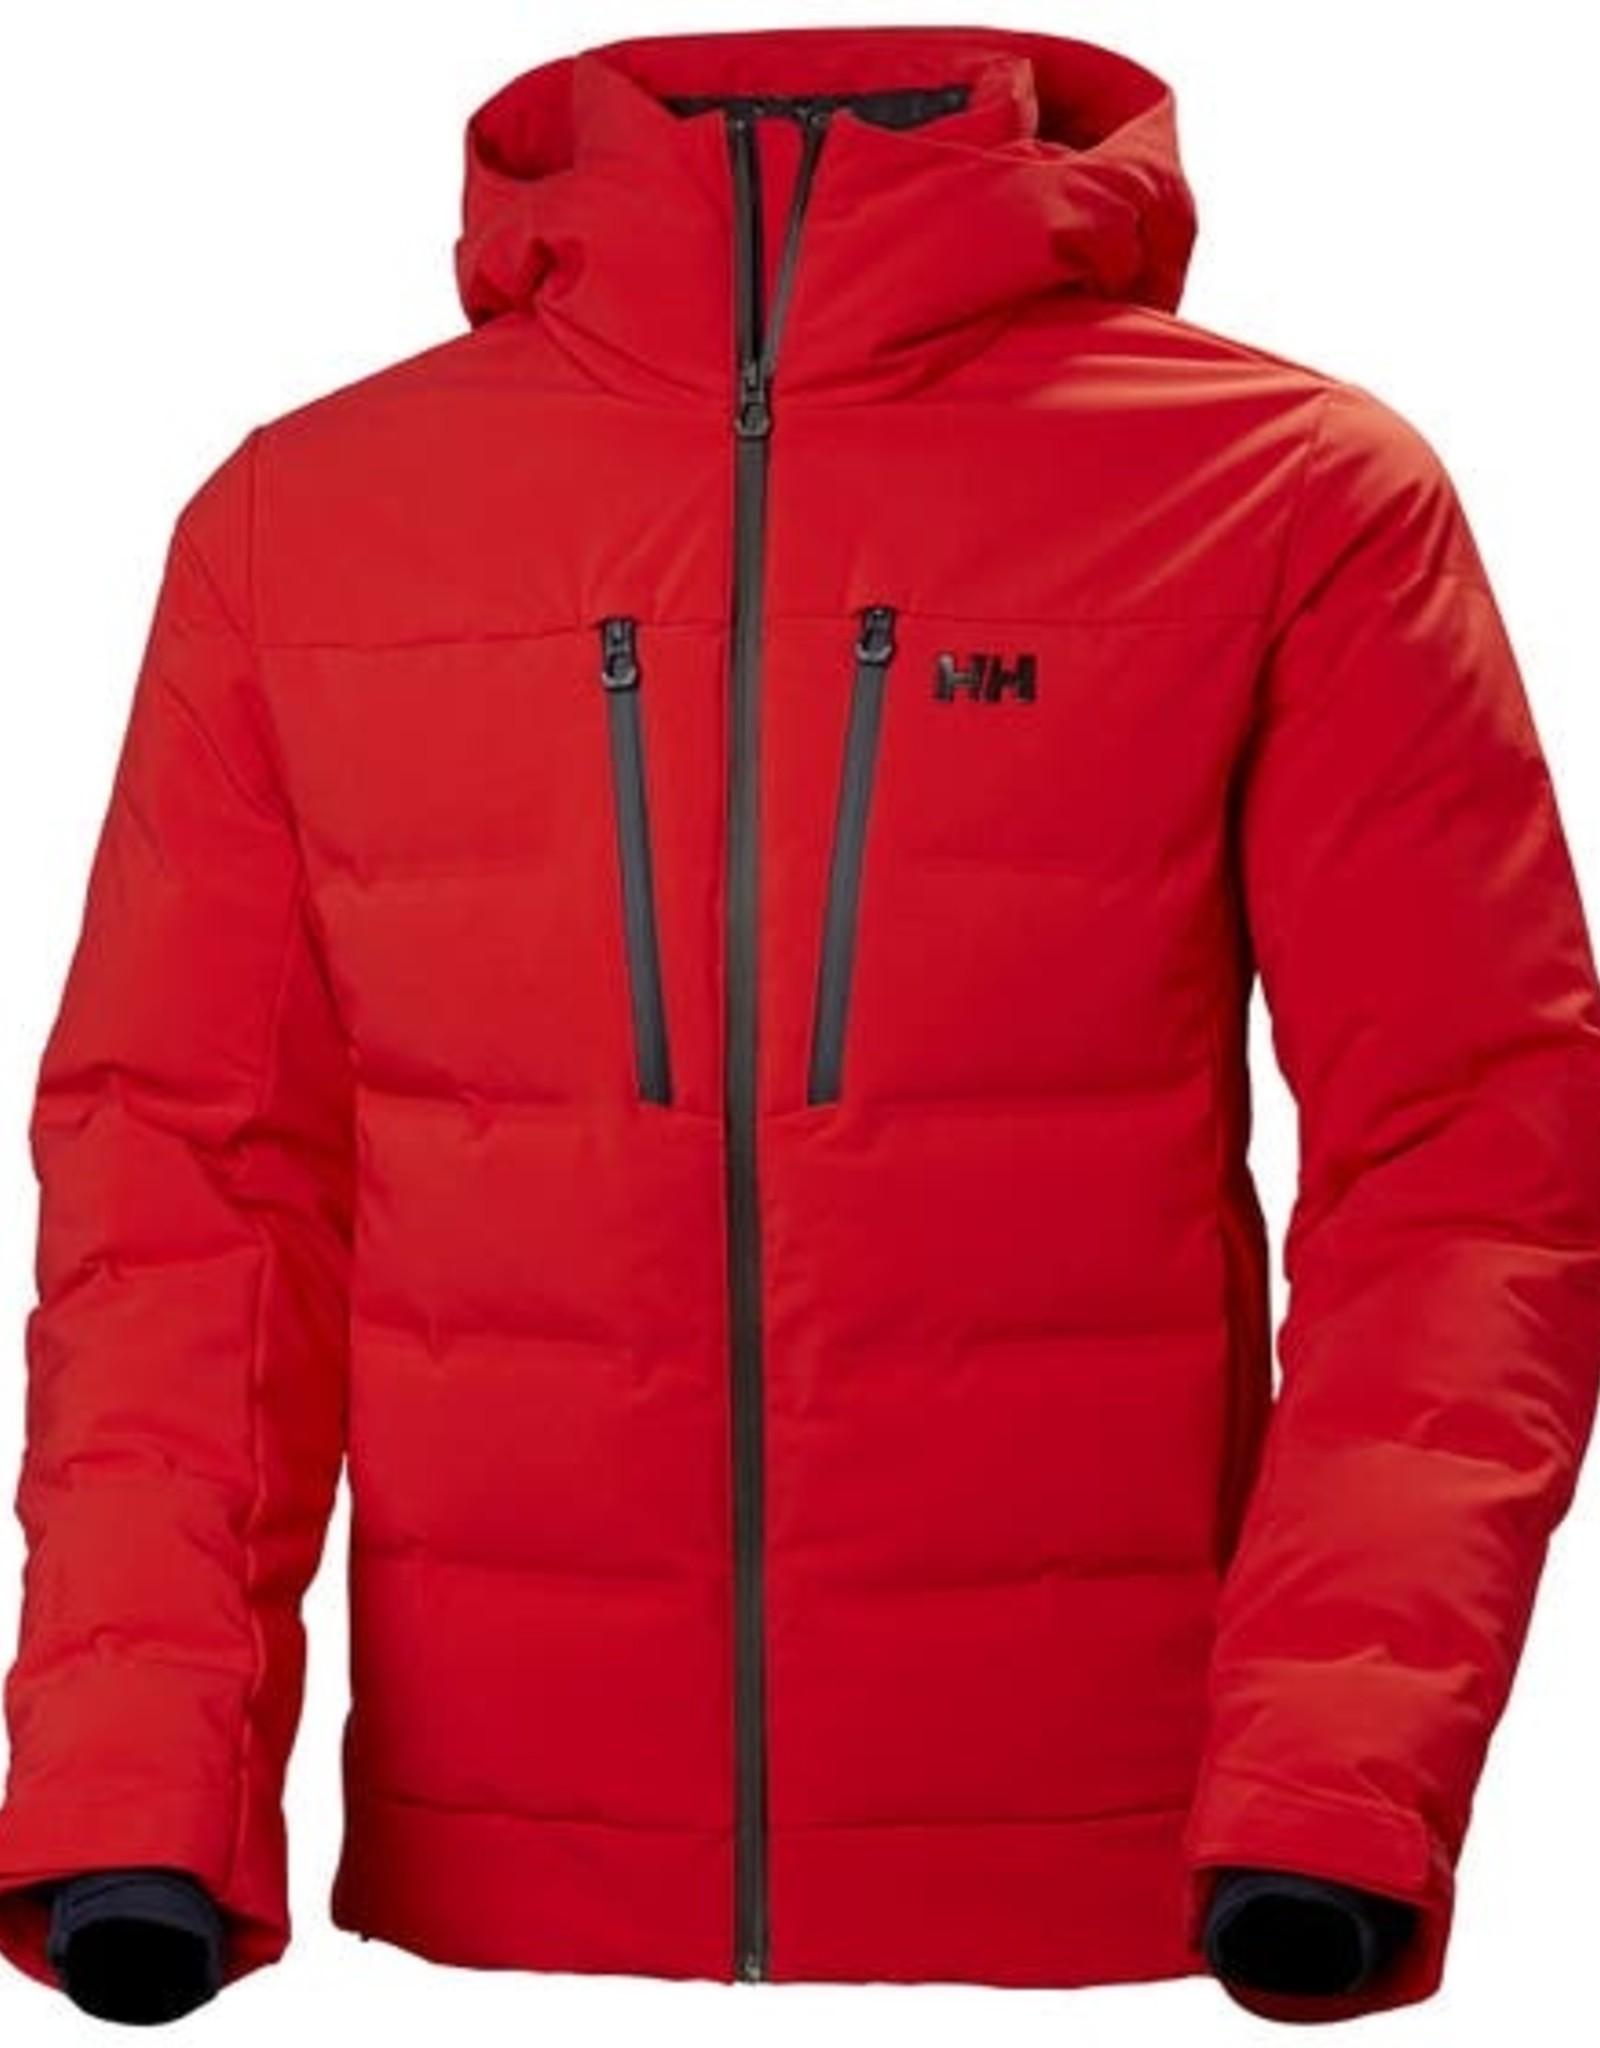 Helly Hansen HH Rivaridge puffy jacket